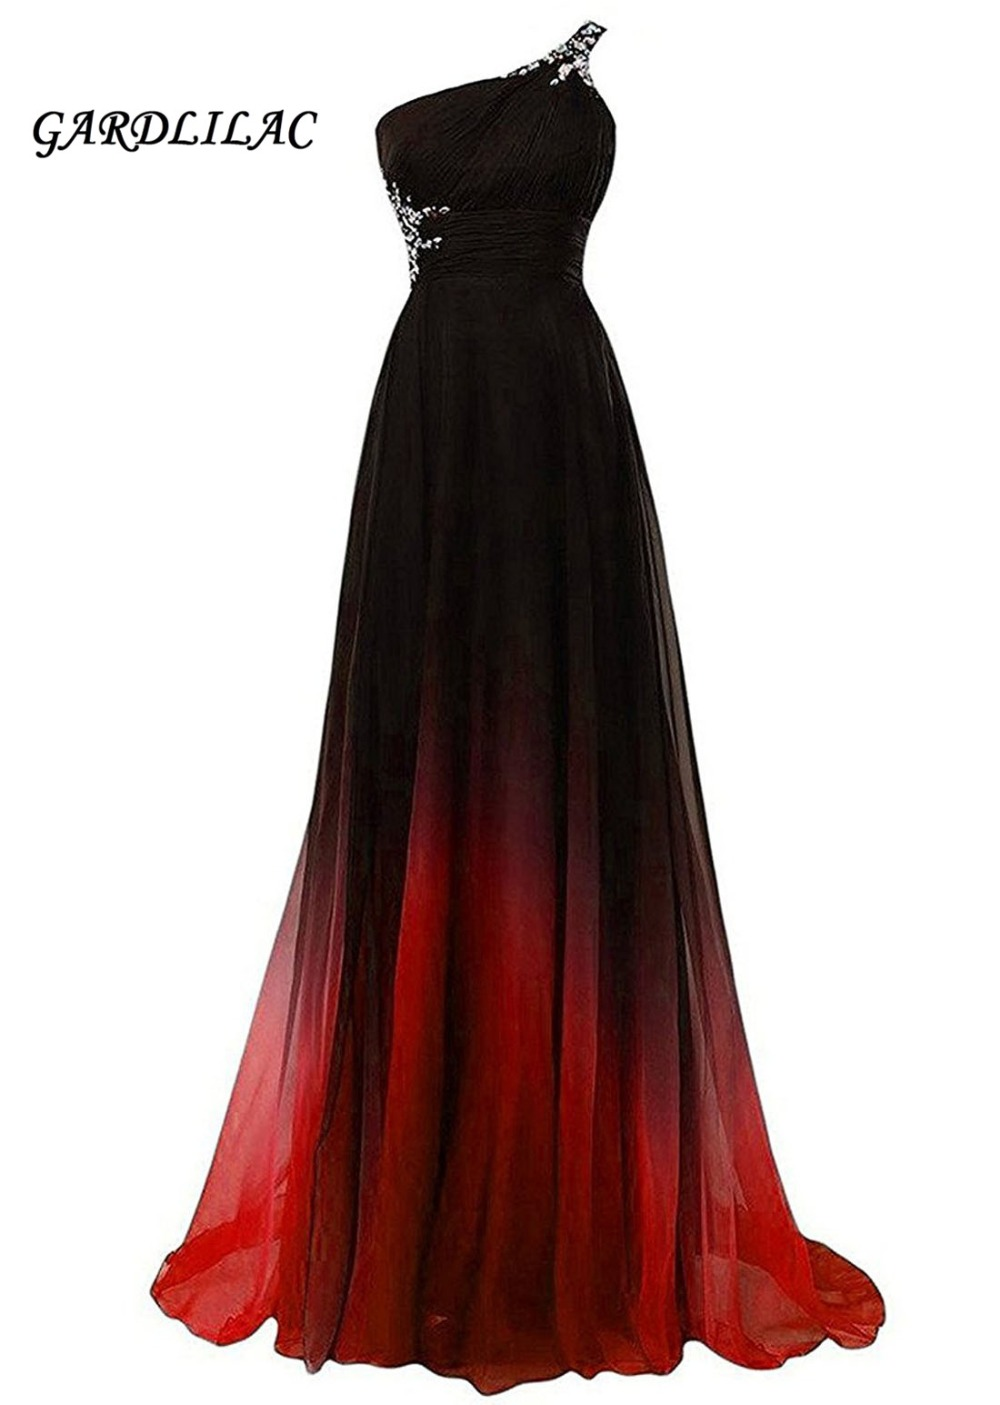 Beaded One-Shoulder Gradient Chiffon   Evening     Dresses   Vestido Longo Prom   Dress   2019 Ombre Prom Long Elegant   Dress   Plus Size